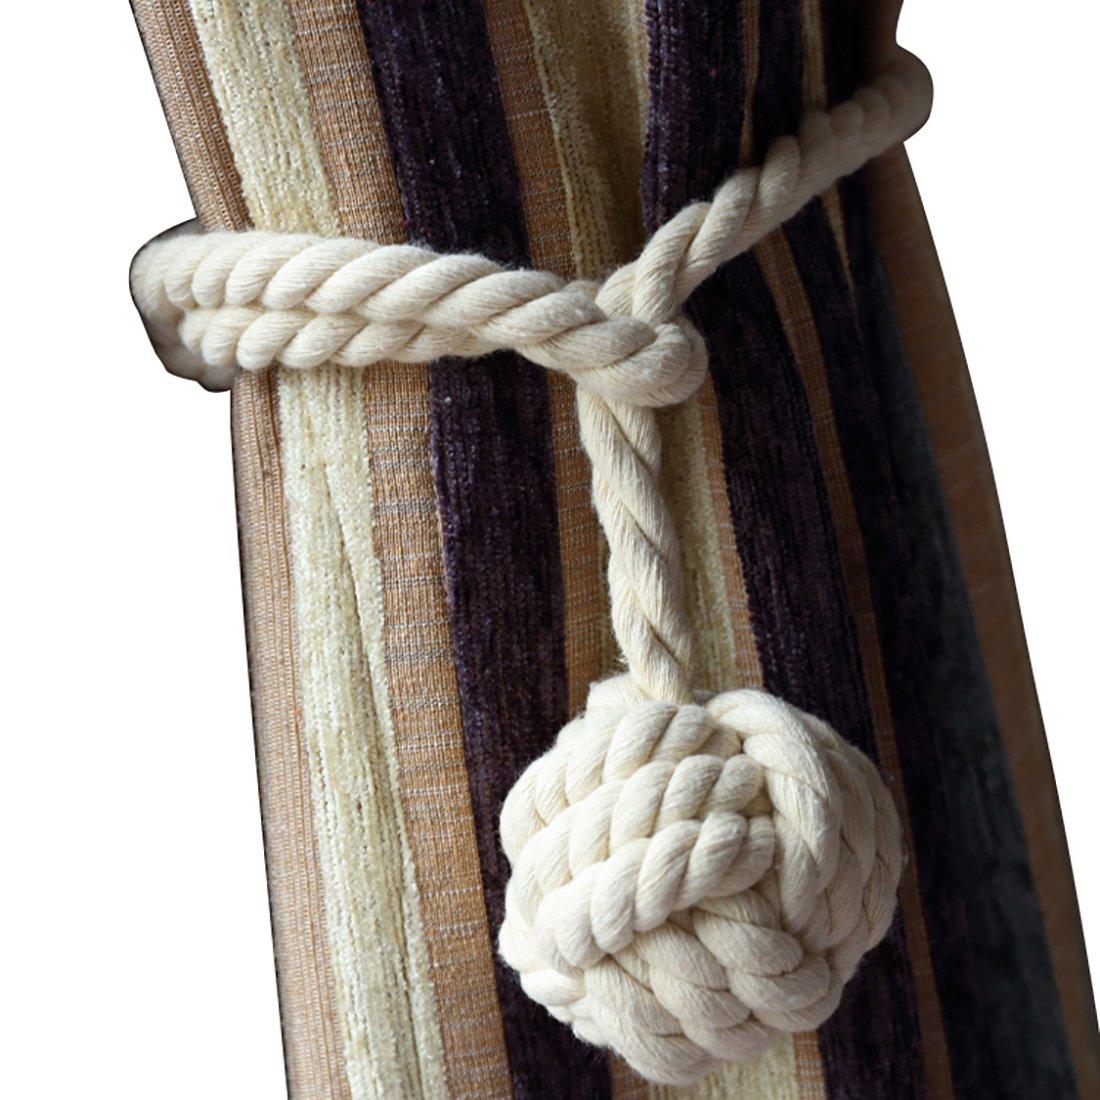 AoDao 2pcs Braided Drapery Tiebacks Curtain Holdbacks Hand Knitting with Double Ball Cotton Rope Beige